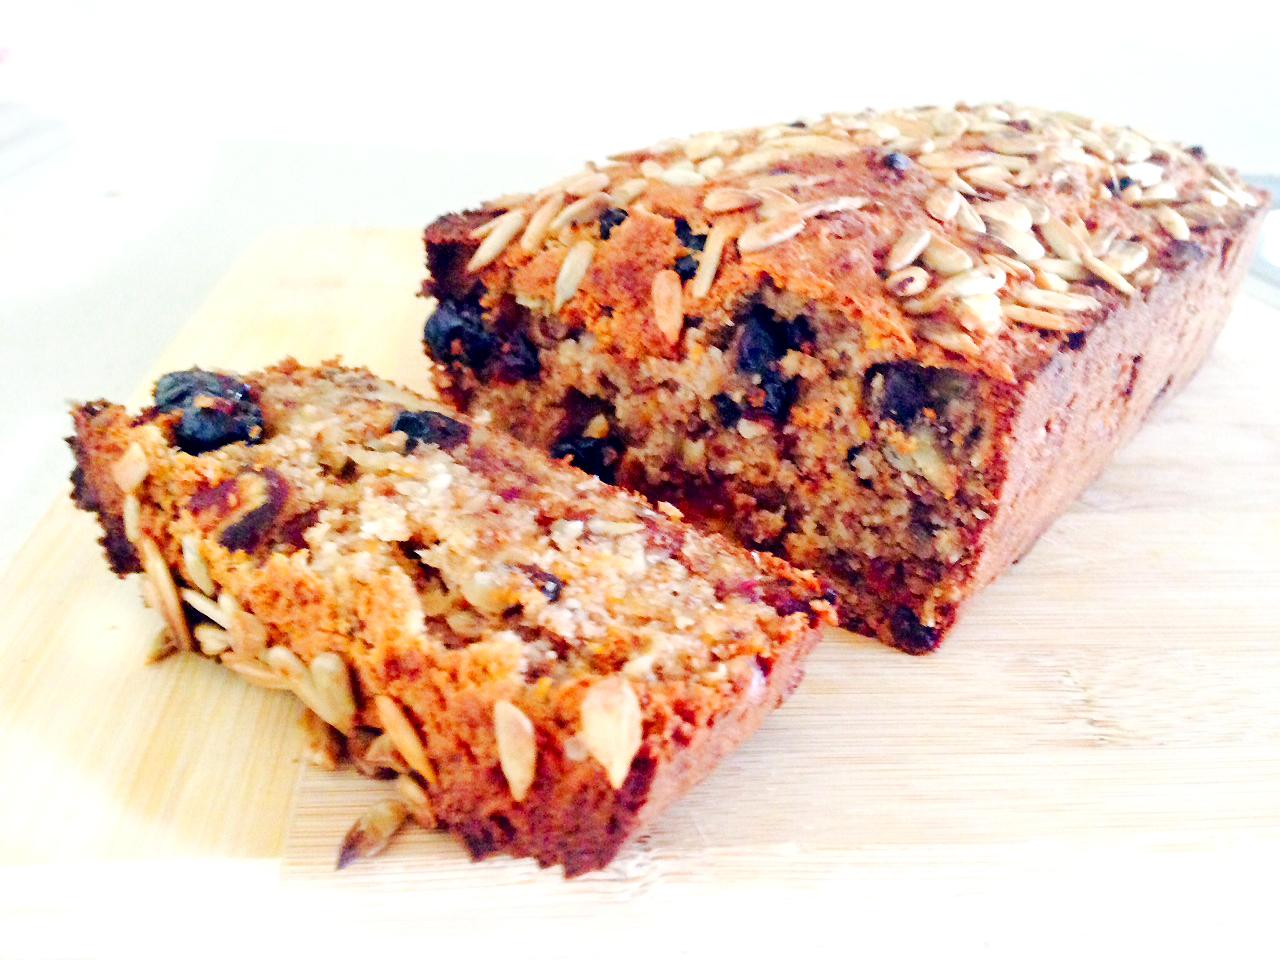 Spiced Carrot, Date + Banana Breakfast Loaf | Get Nakie